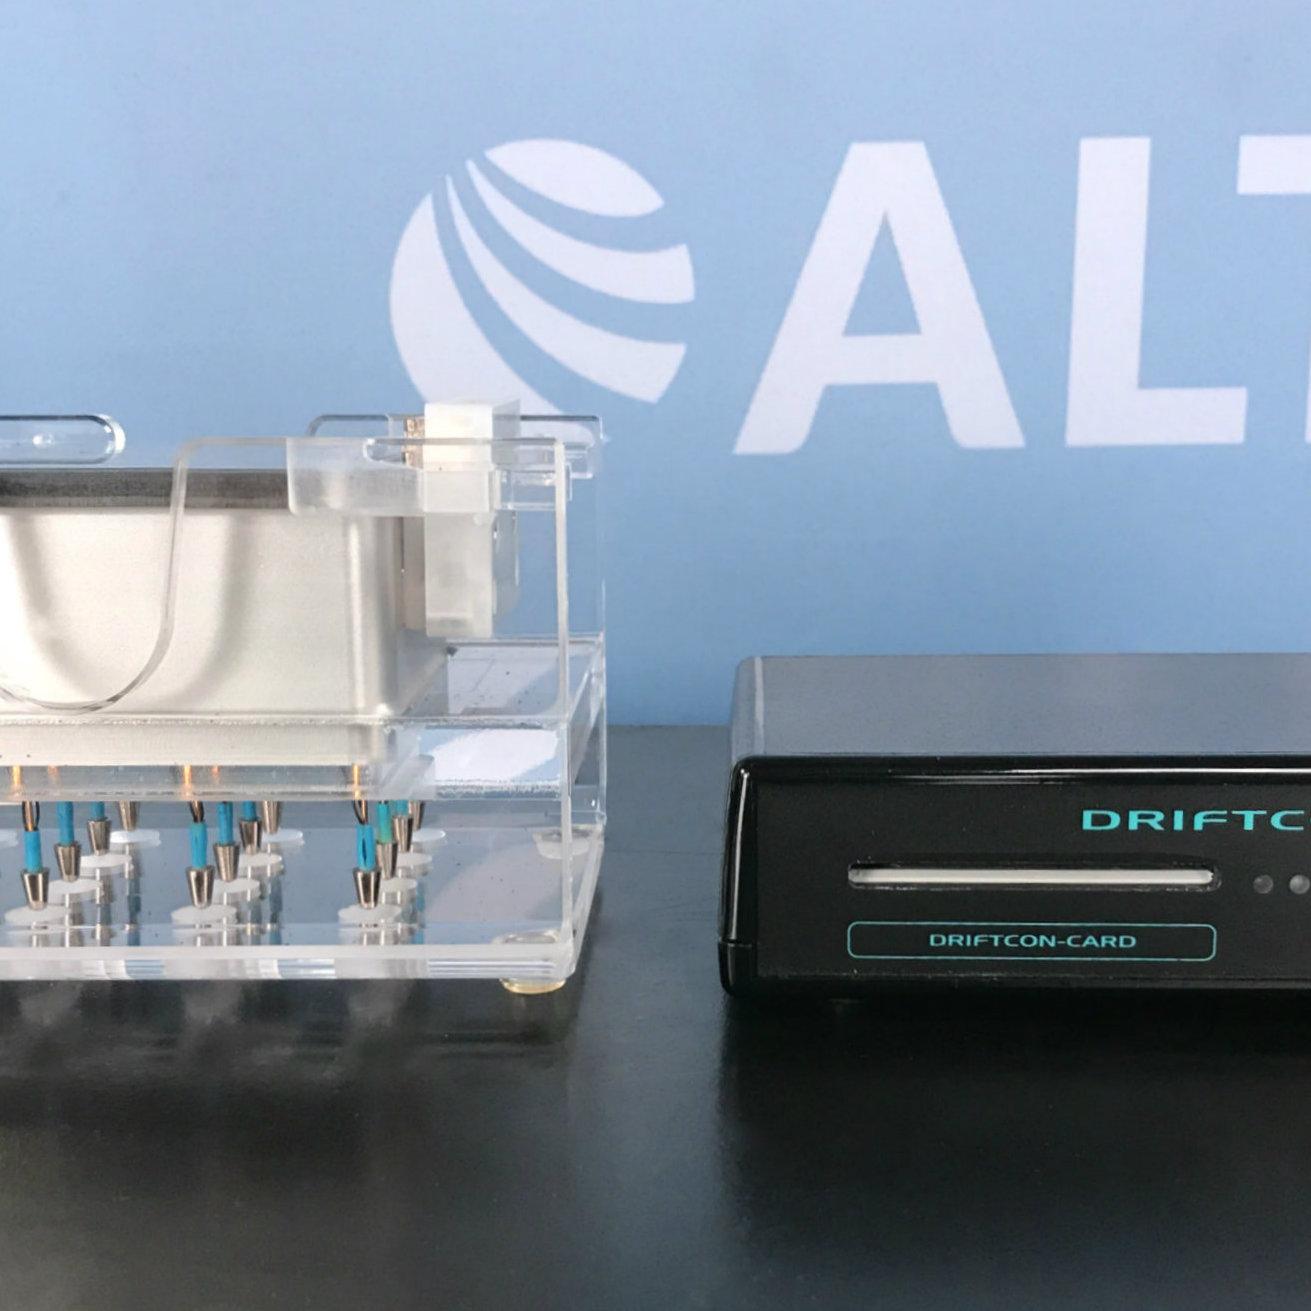 Driftcon High Precision Temperature Measurement System Name